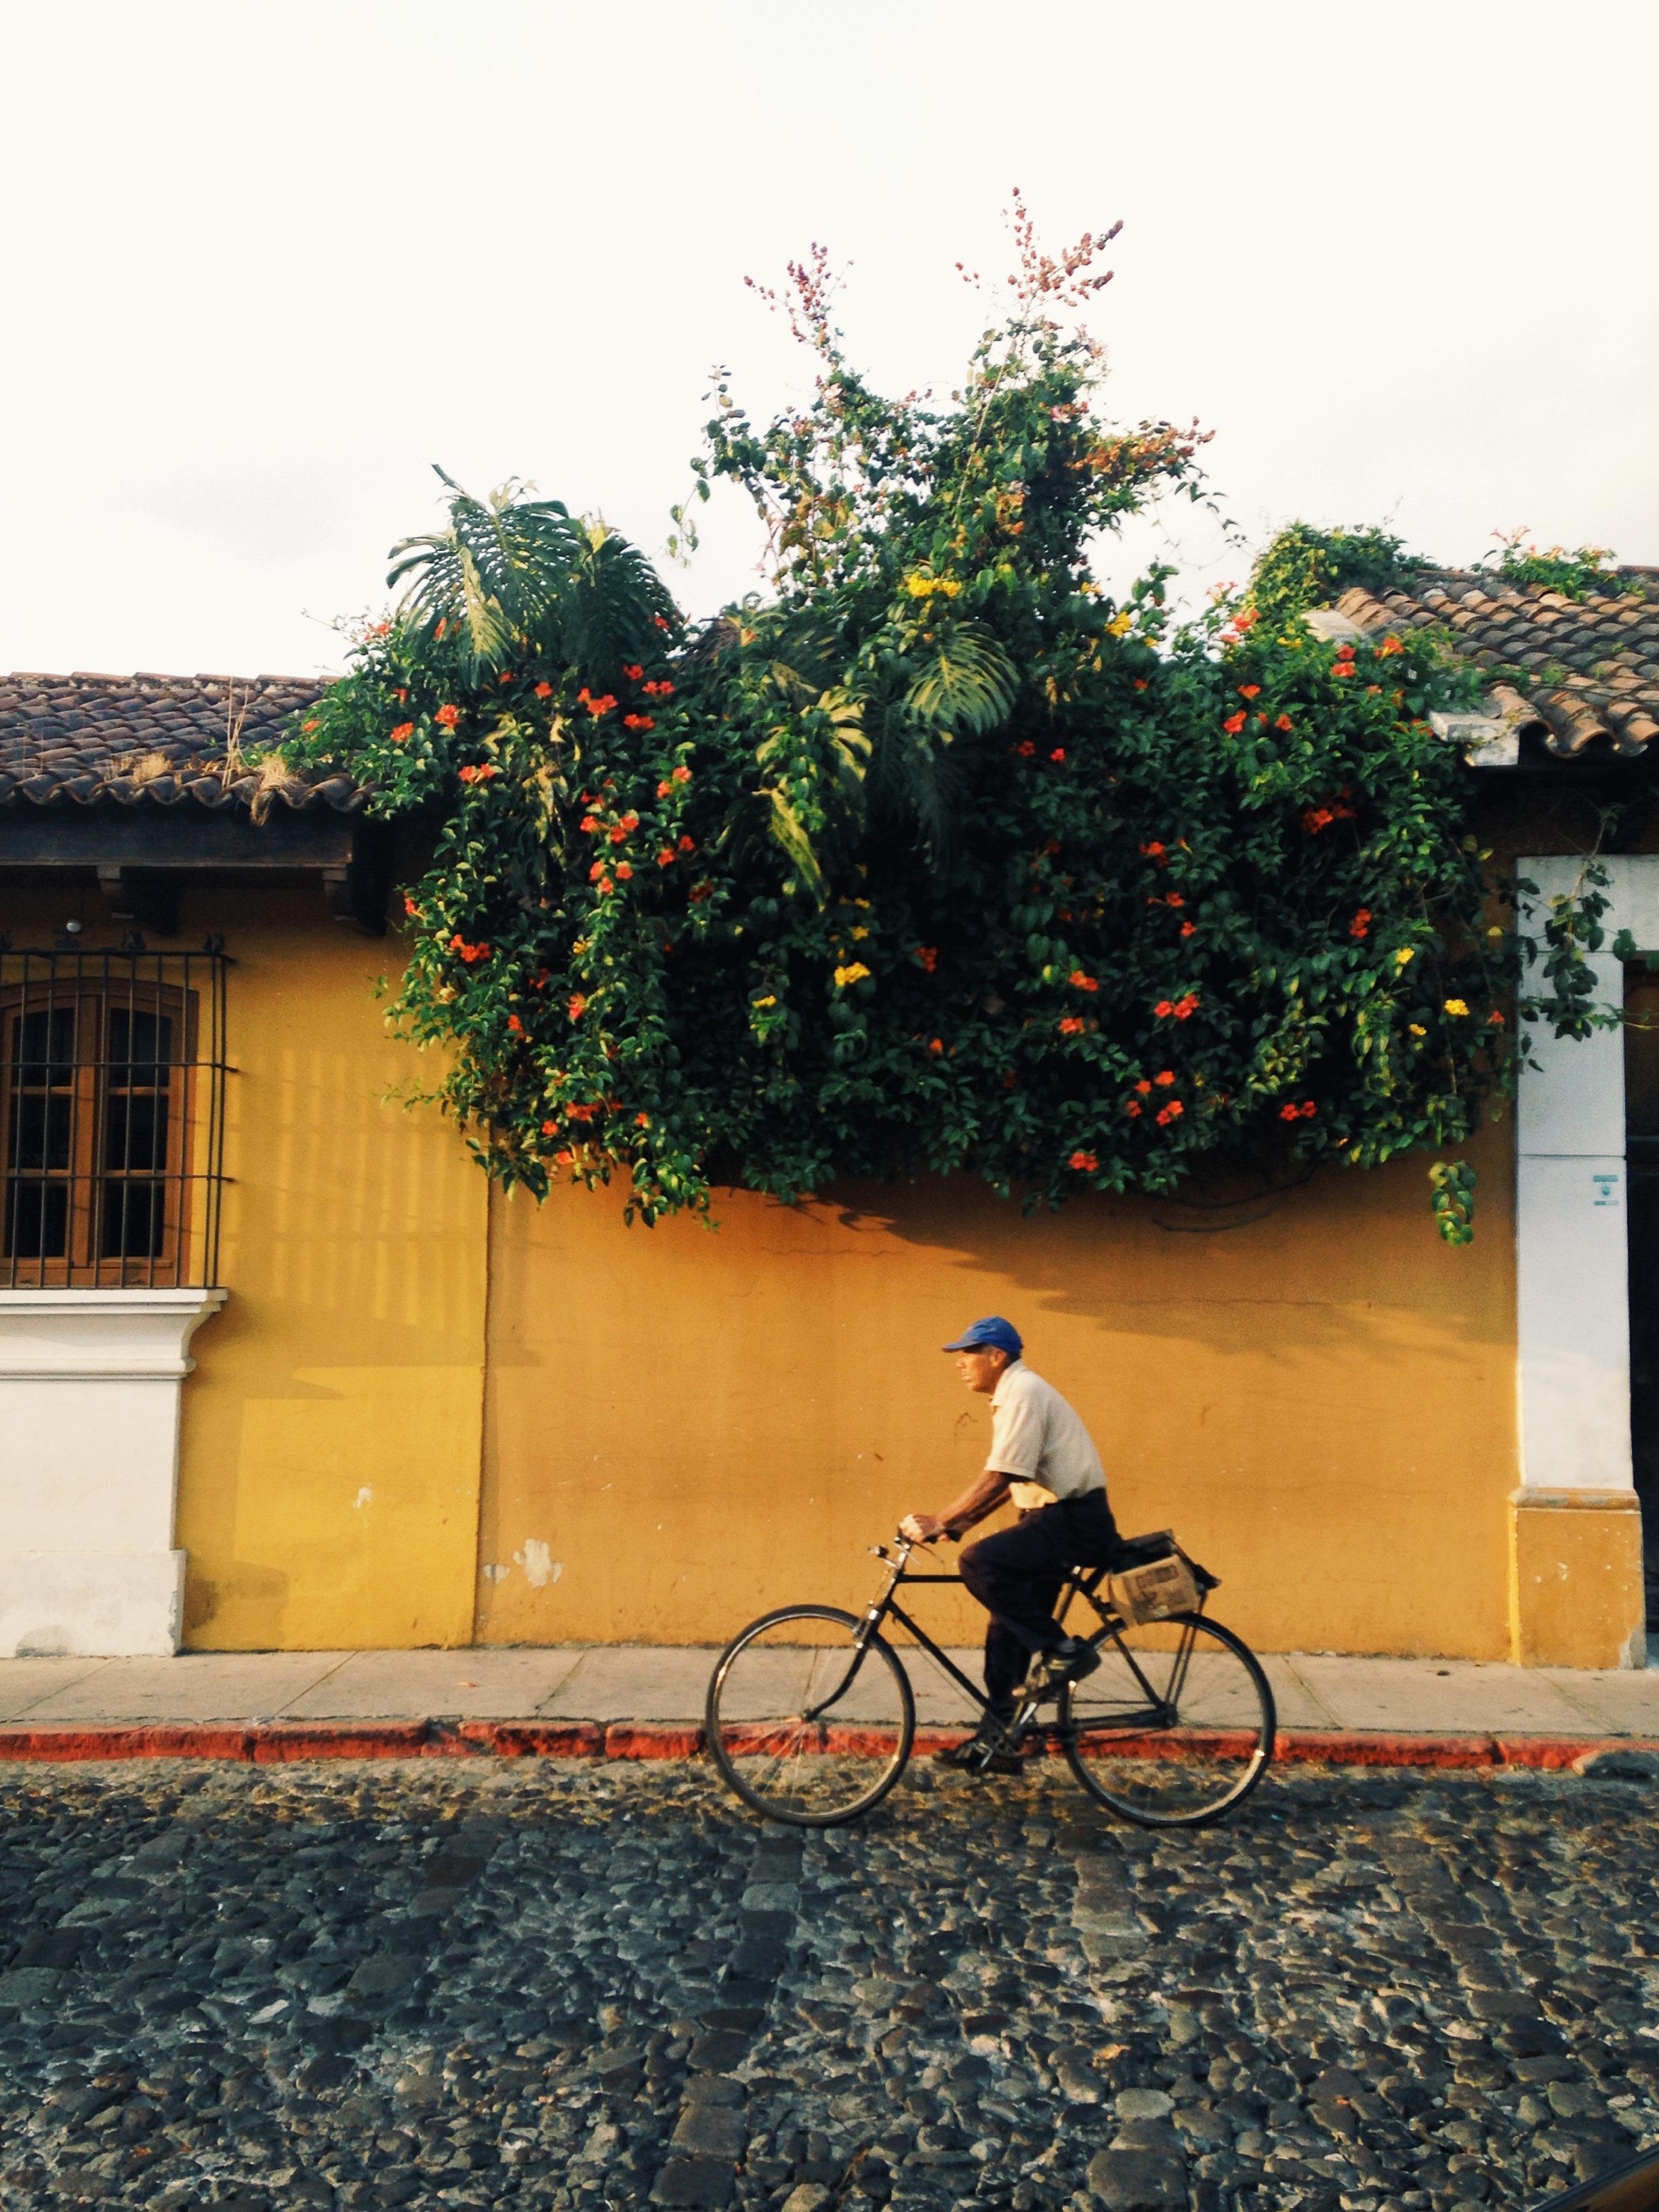 Captured in Antigua, Guatemala.